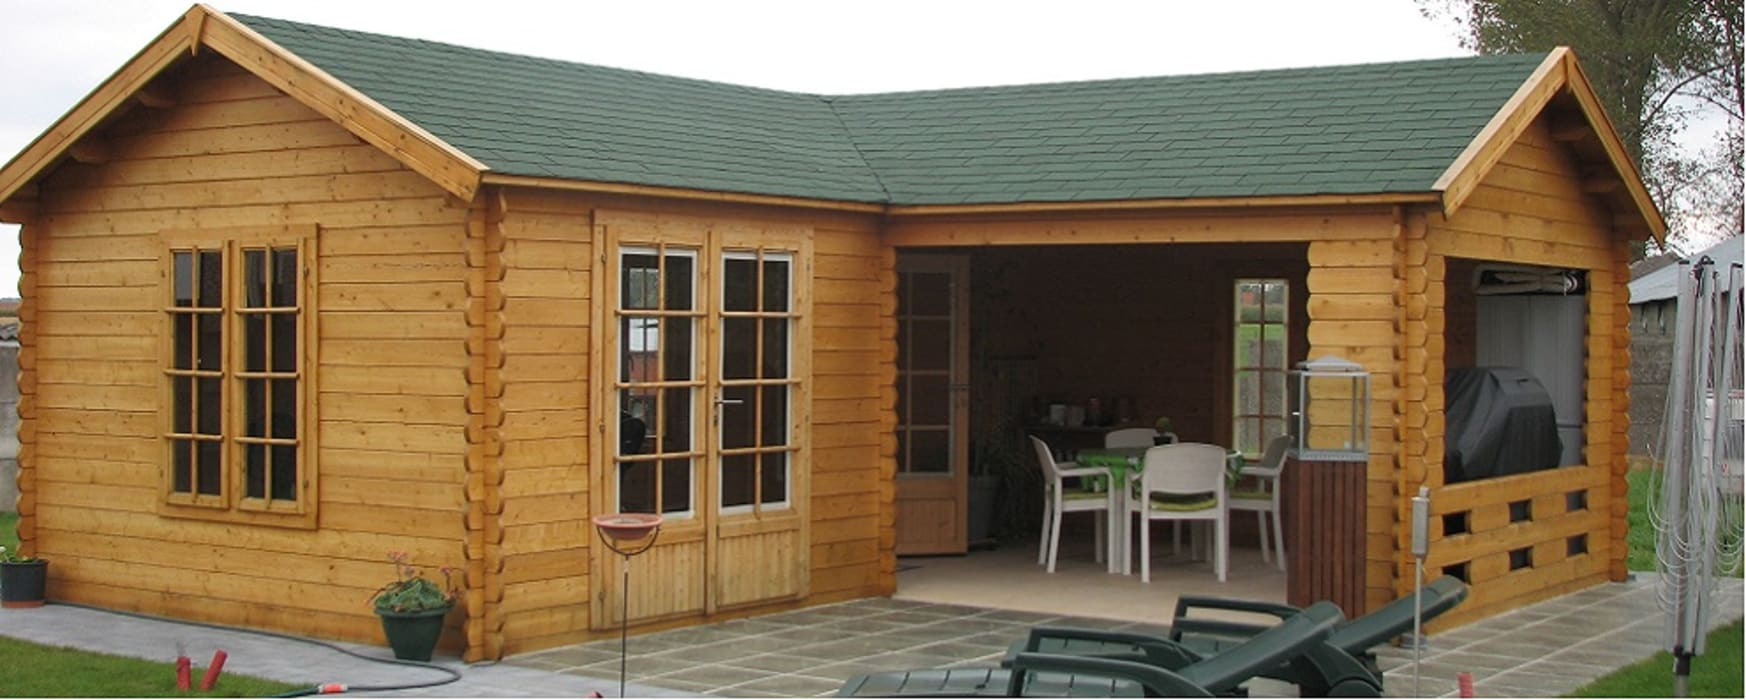 Large l shape Garden Building:  Spa by Cotswold Garden Buildings, Classic Wood Wood effect